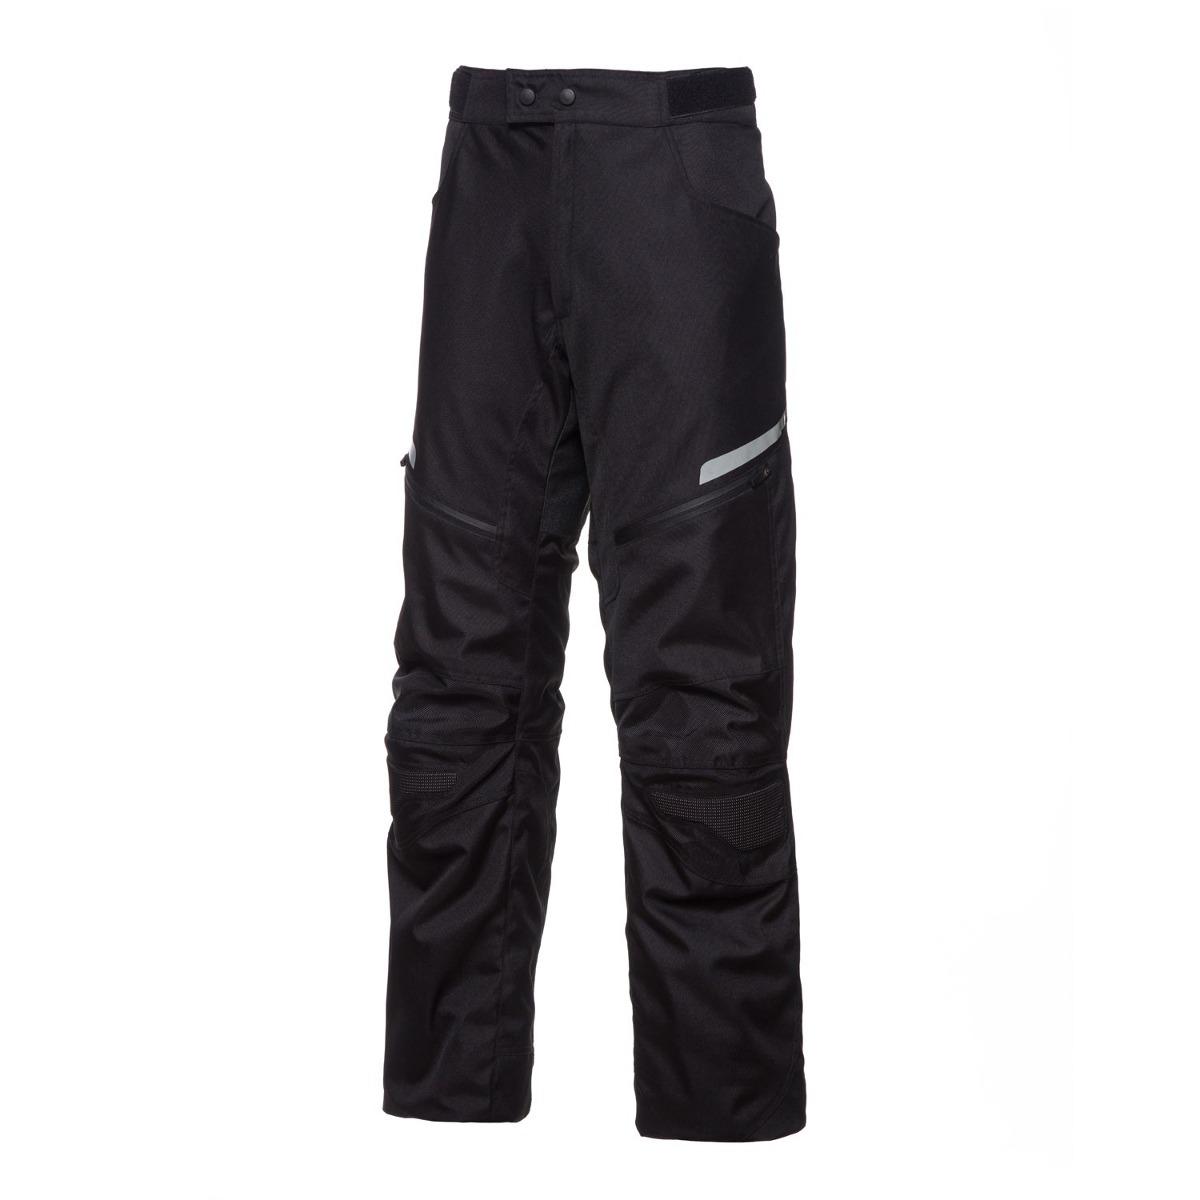 pantalon cordura fuse nineTOone by ls2 negro talle xxxl